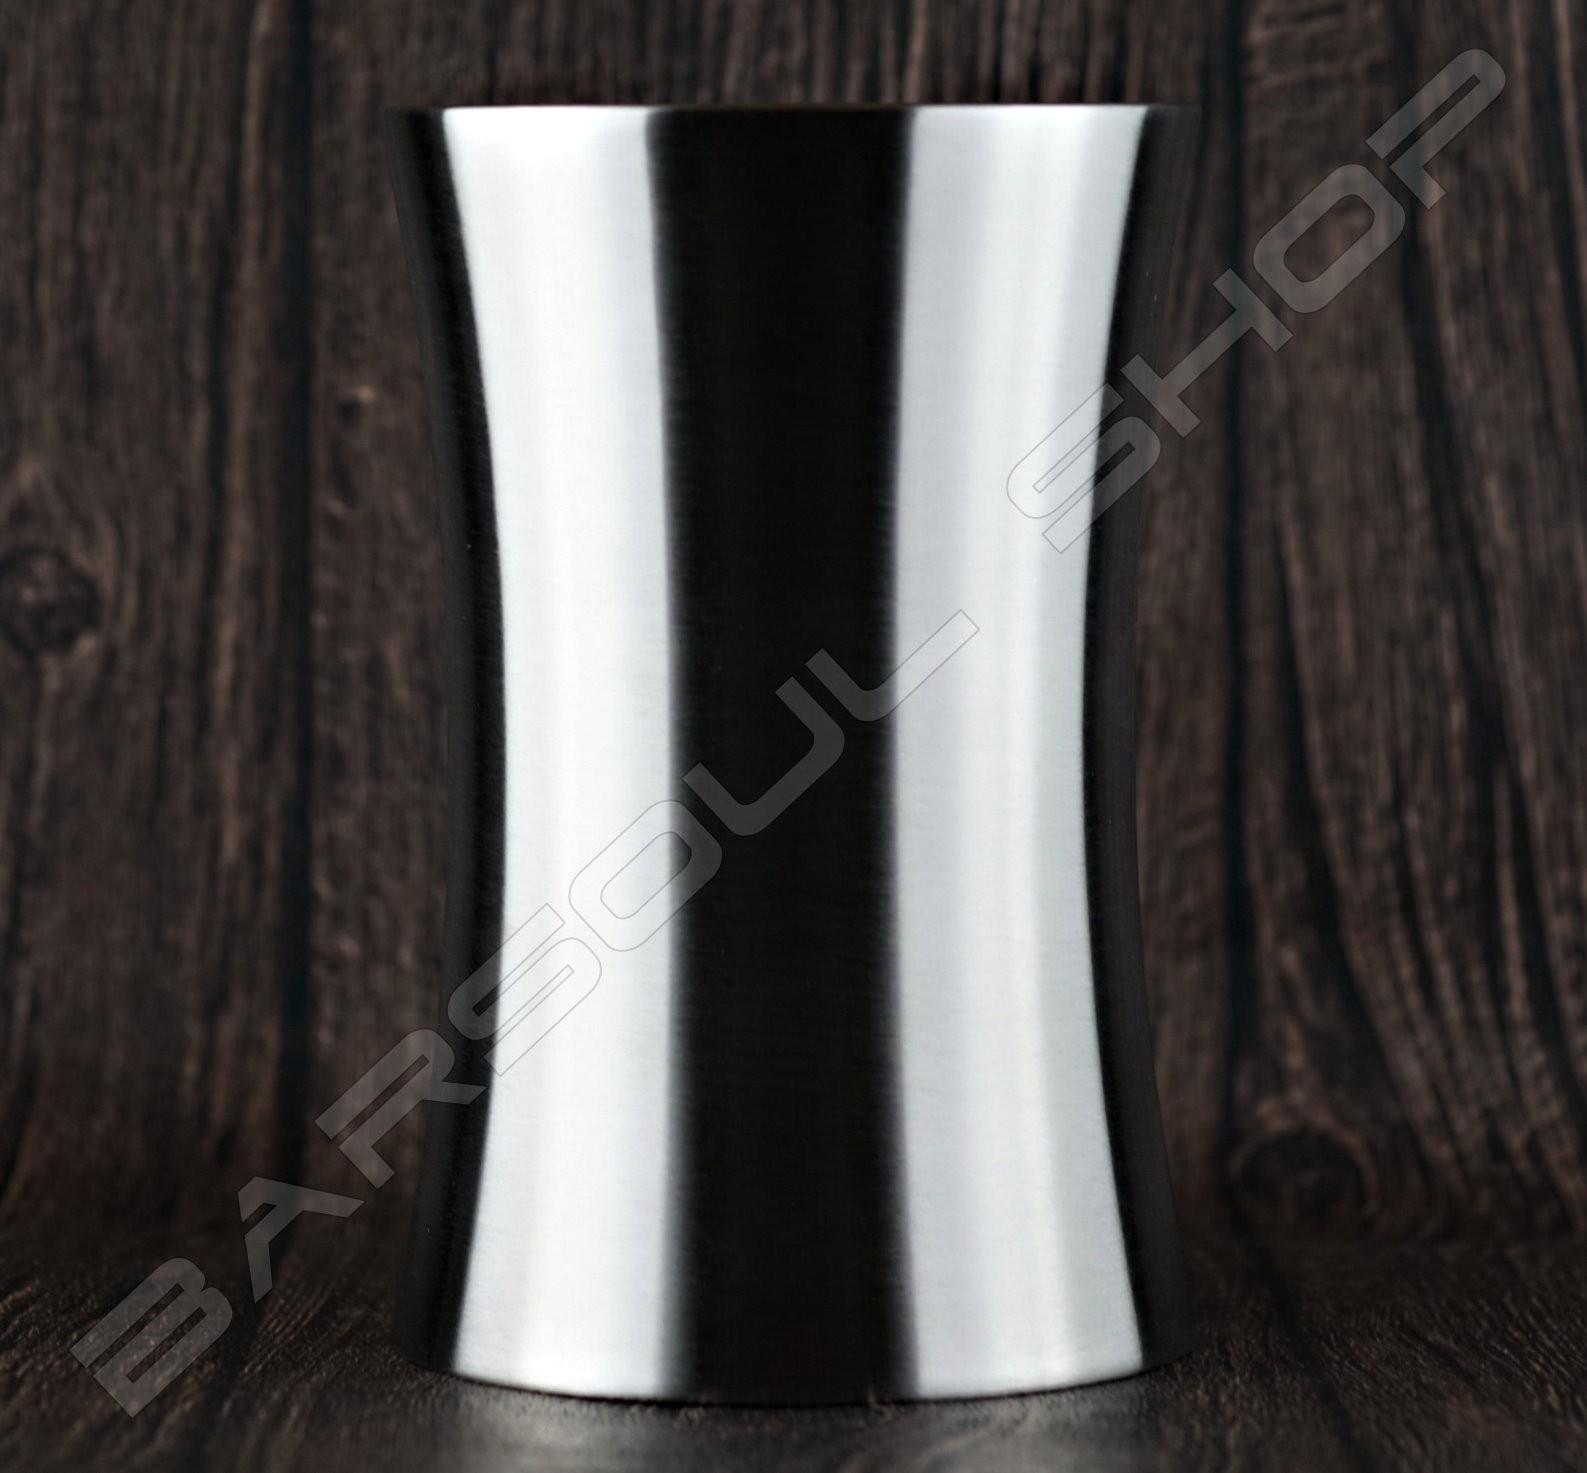 腰身雙層不鏽鋼吧匙筒 Curve barspoon cylinder